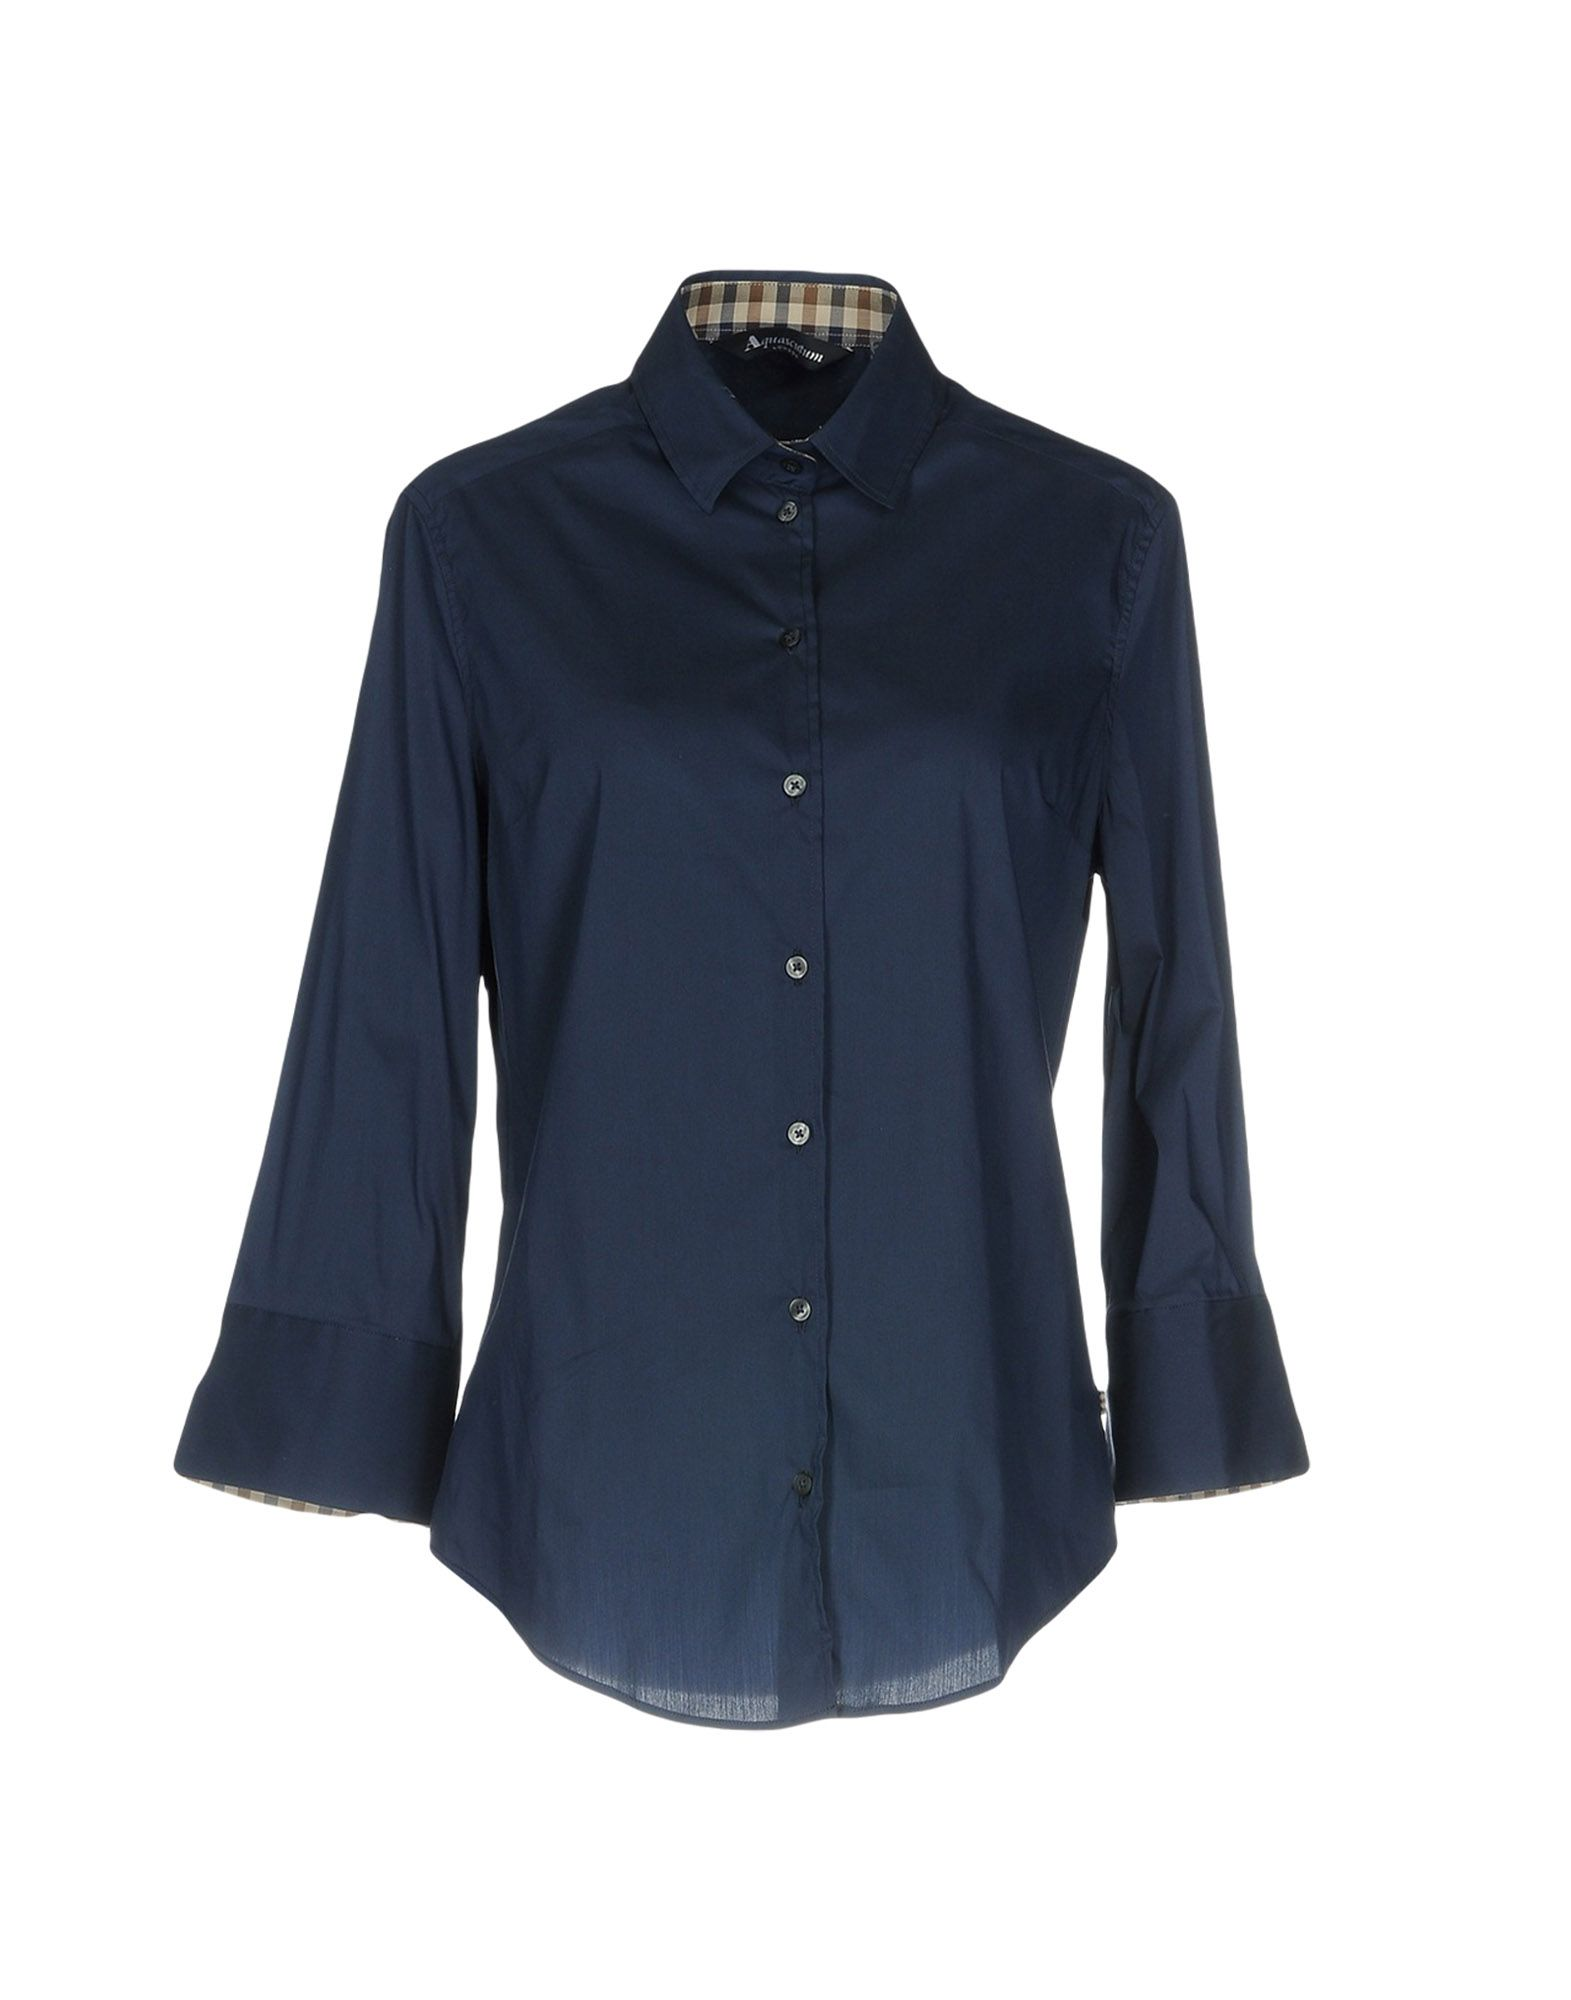 AQUASCUTUM Solid Color Shirts & Blouses in Dark Blue